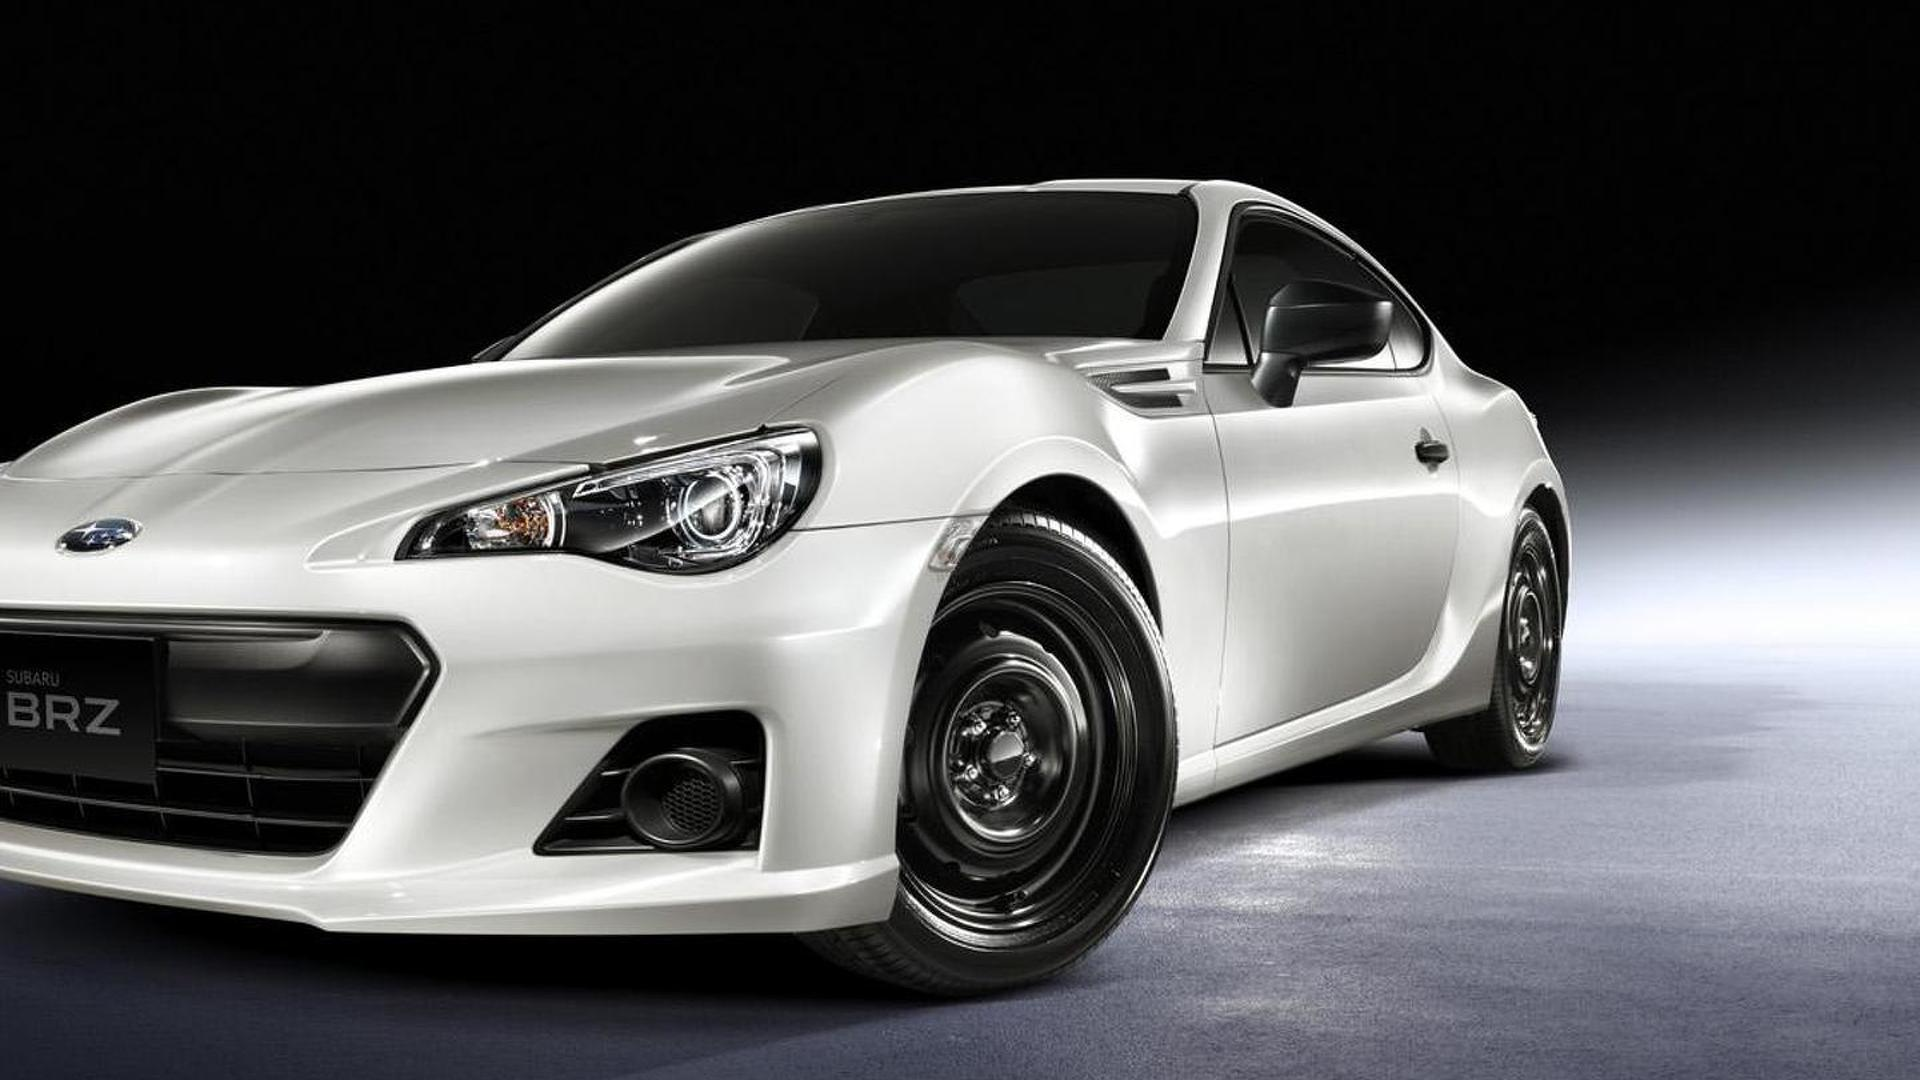 Toyota GT-86 and Subaru BRZ purist-spec versions released (JDM)